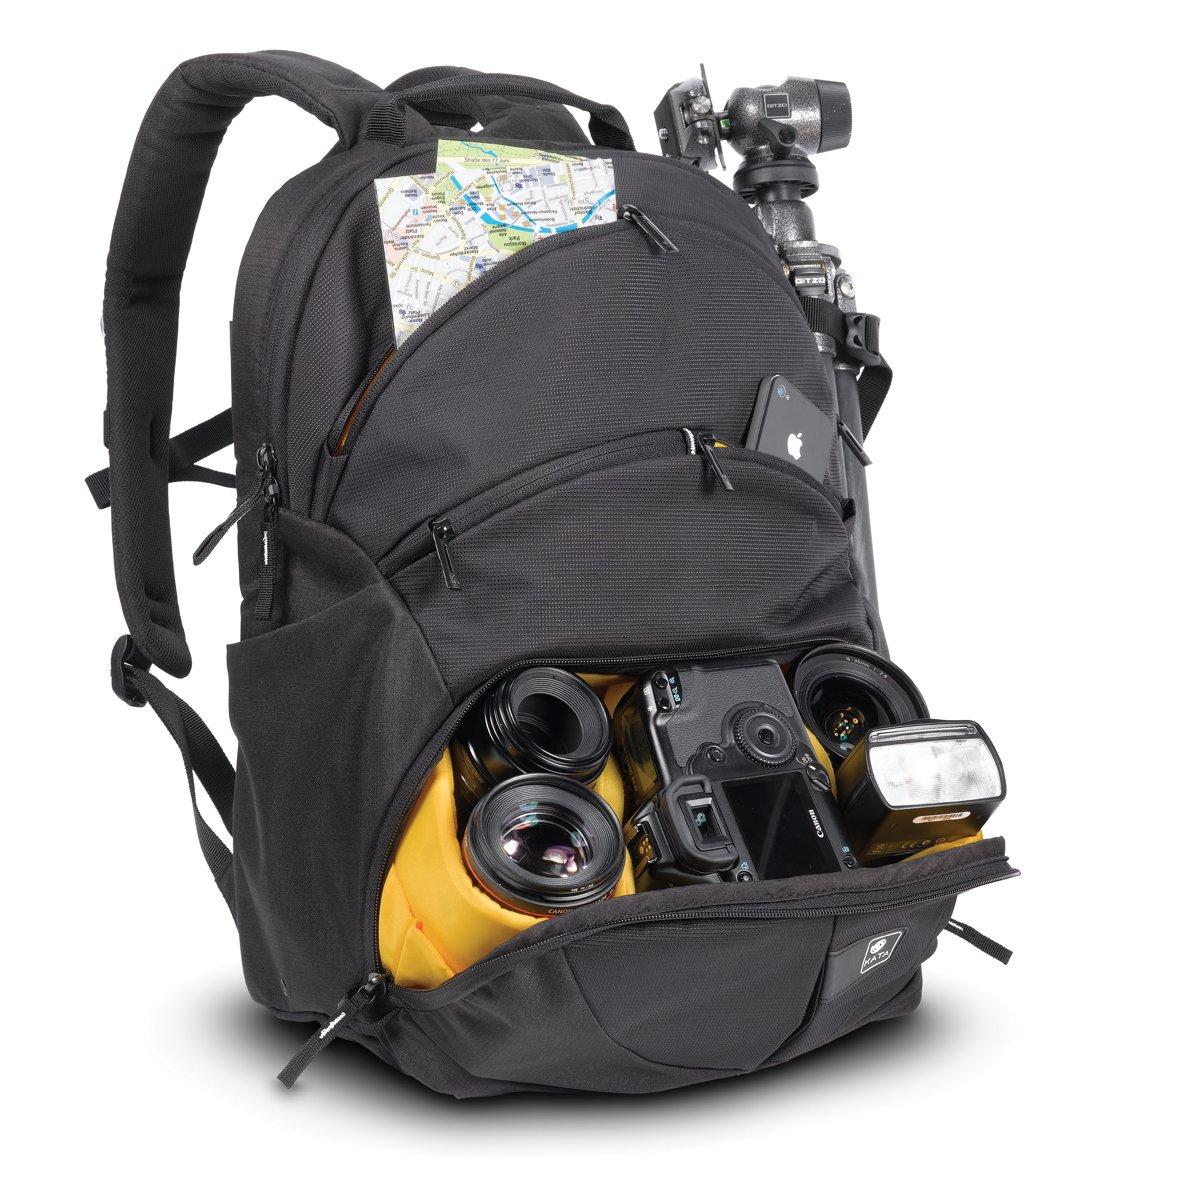 Kata KT DL-DR-467 - Mochila para cámaras fotográficas réflex: Amazon.es: Electrónica